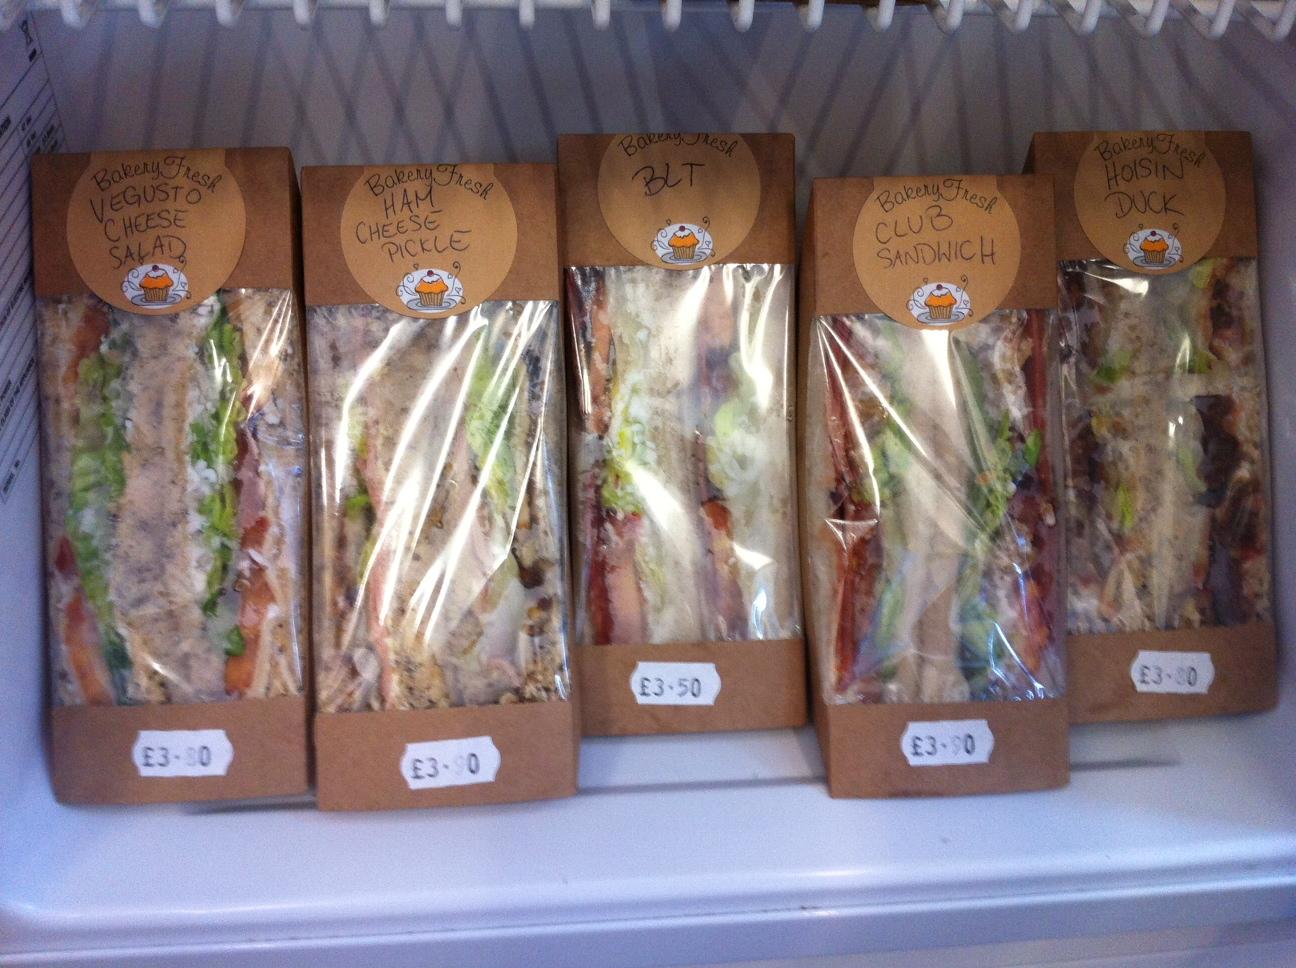 Gourmet to go vegan sandwiches